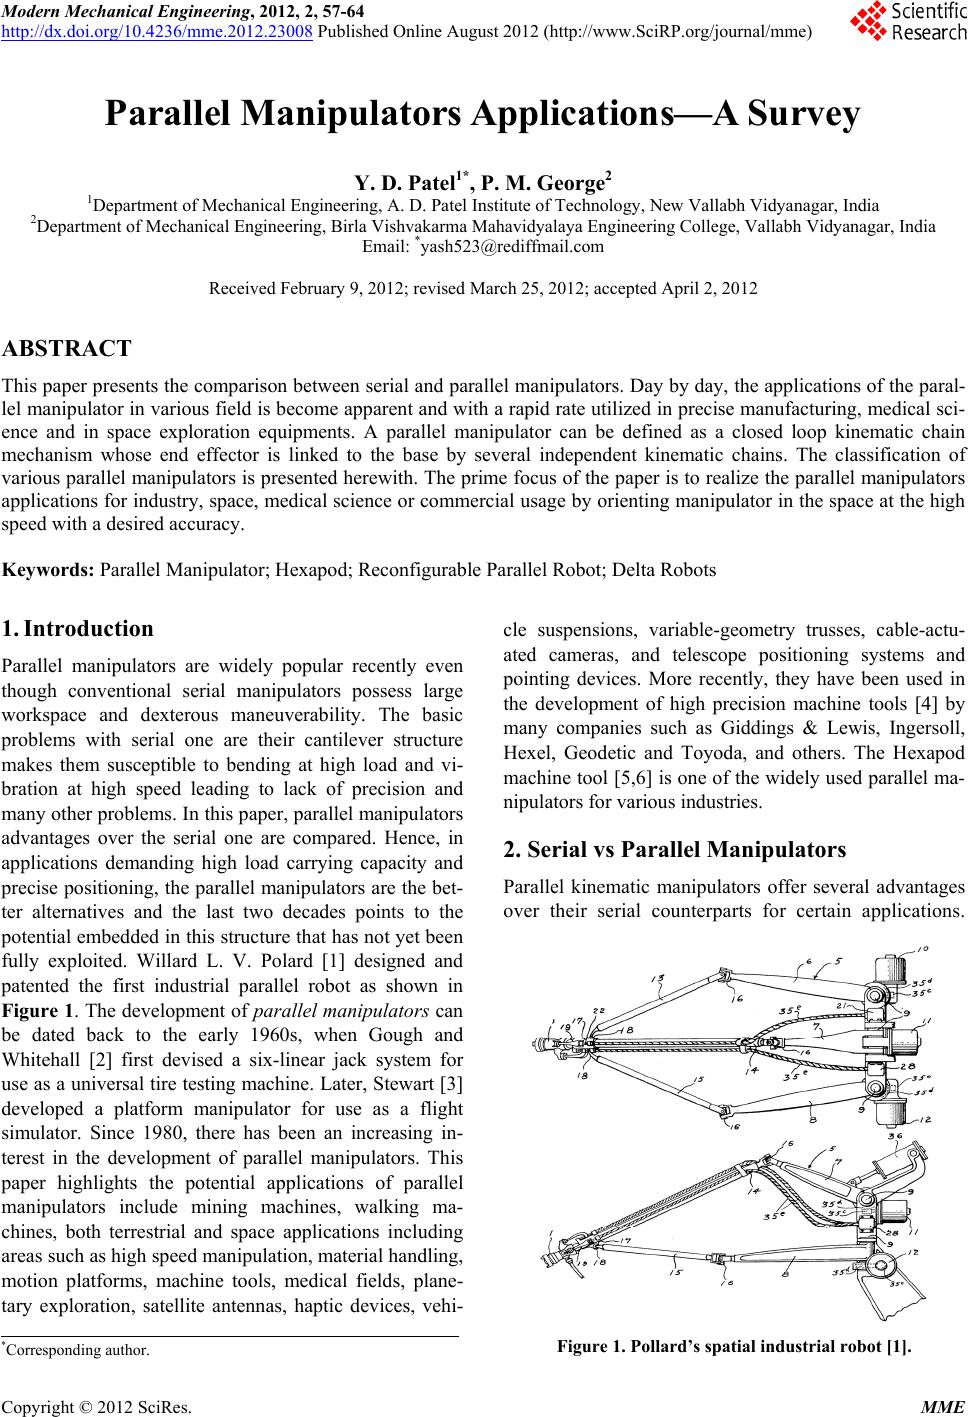 Parallel Manipulators Applications—A Survey